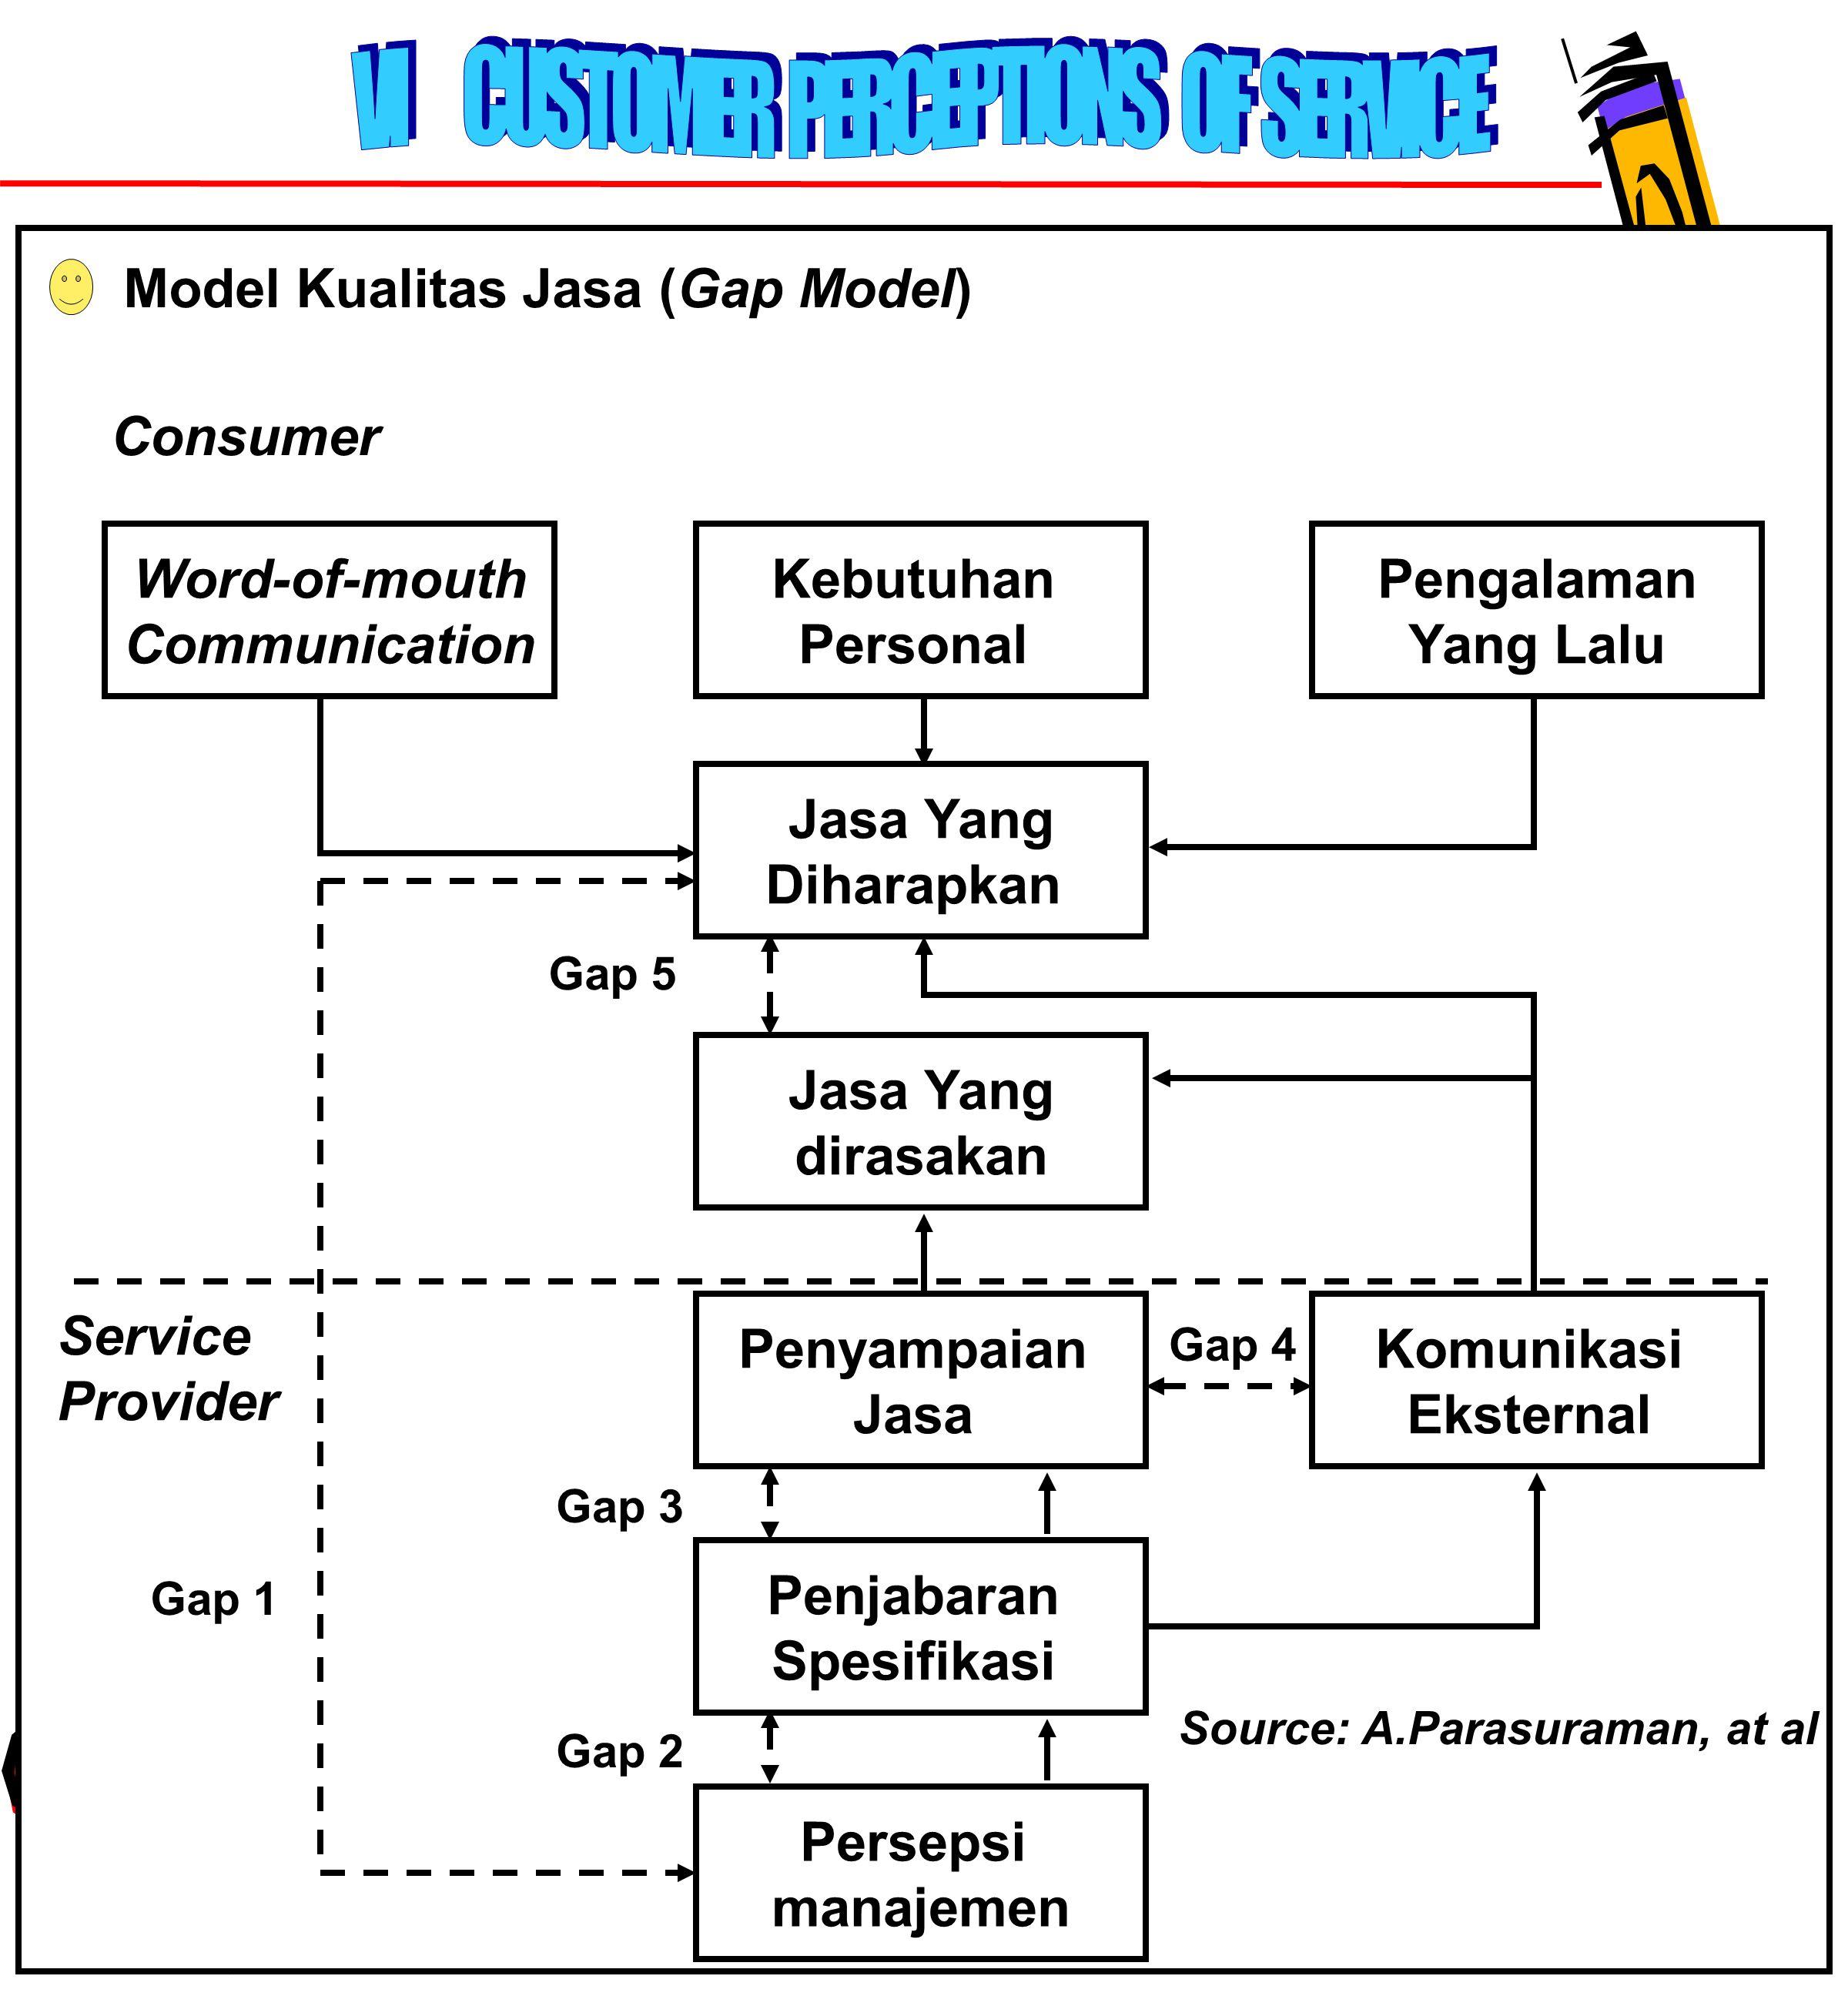 77 Model Kualitas Jasa (Gap Model) Word-of-mouth Communication Komunikasi Eksternal Persepsi manajemen Penjabaran Spesifikasi Penyampaian Jasa Jasa Yang dirasakan Jasa Yang Diharapkan Pengalaman Yang Lalu Kebutuhan Personal Service Provider Consumer Gap 4 Gap 3 Gap 2 Gap 1 Gap 5 Source: A.Parasuraman, at al